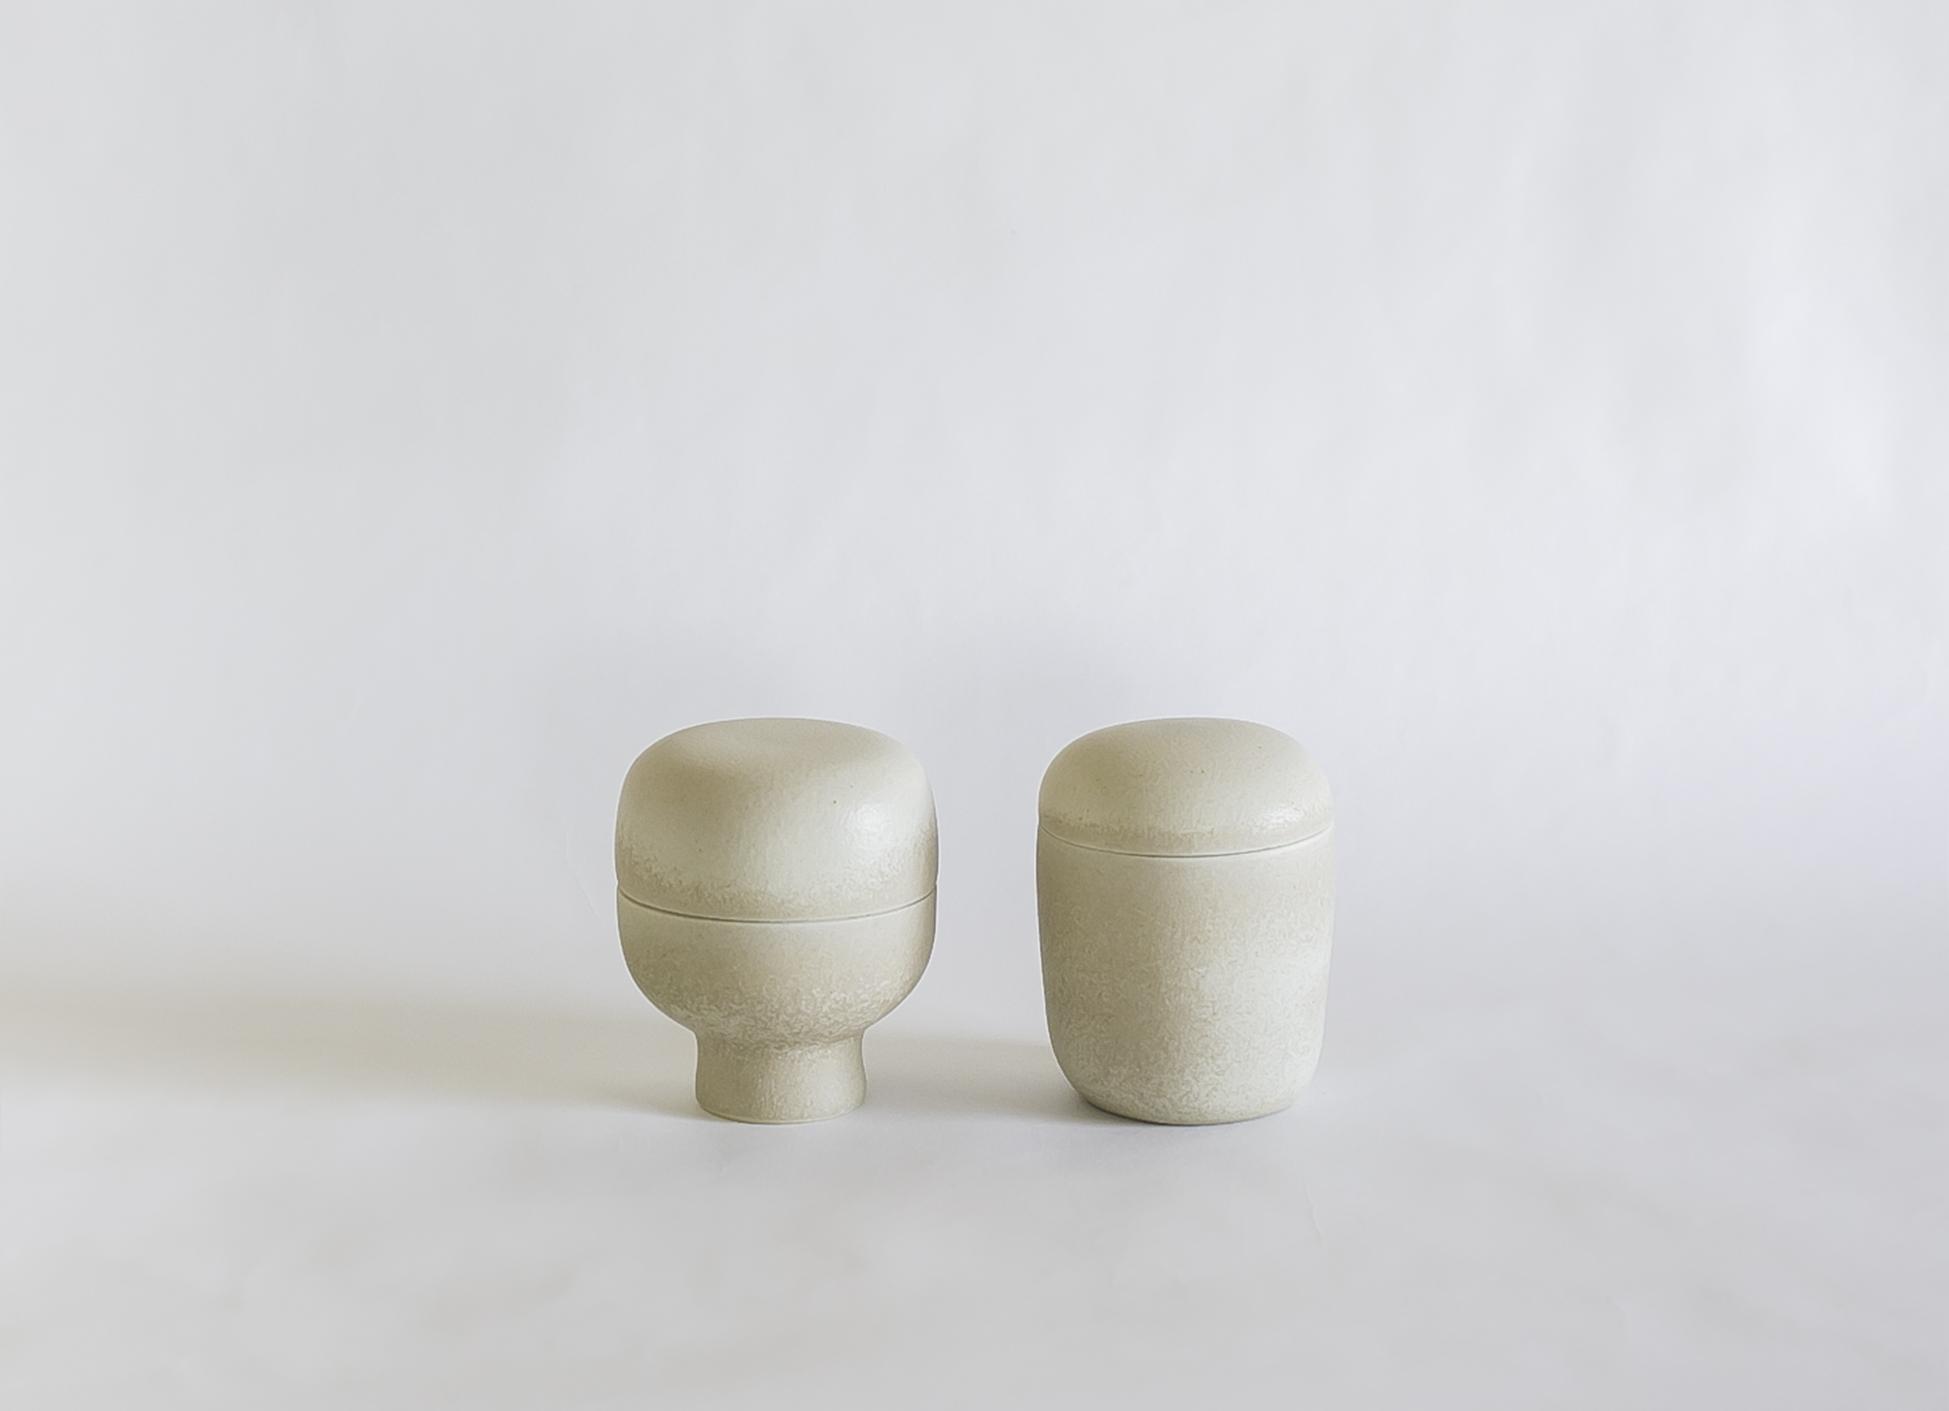 b5_mdba_mdby_ceramics_manufactured_porcelain_mushimegane_books